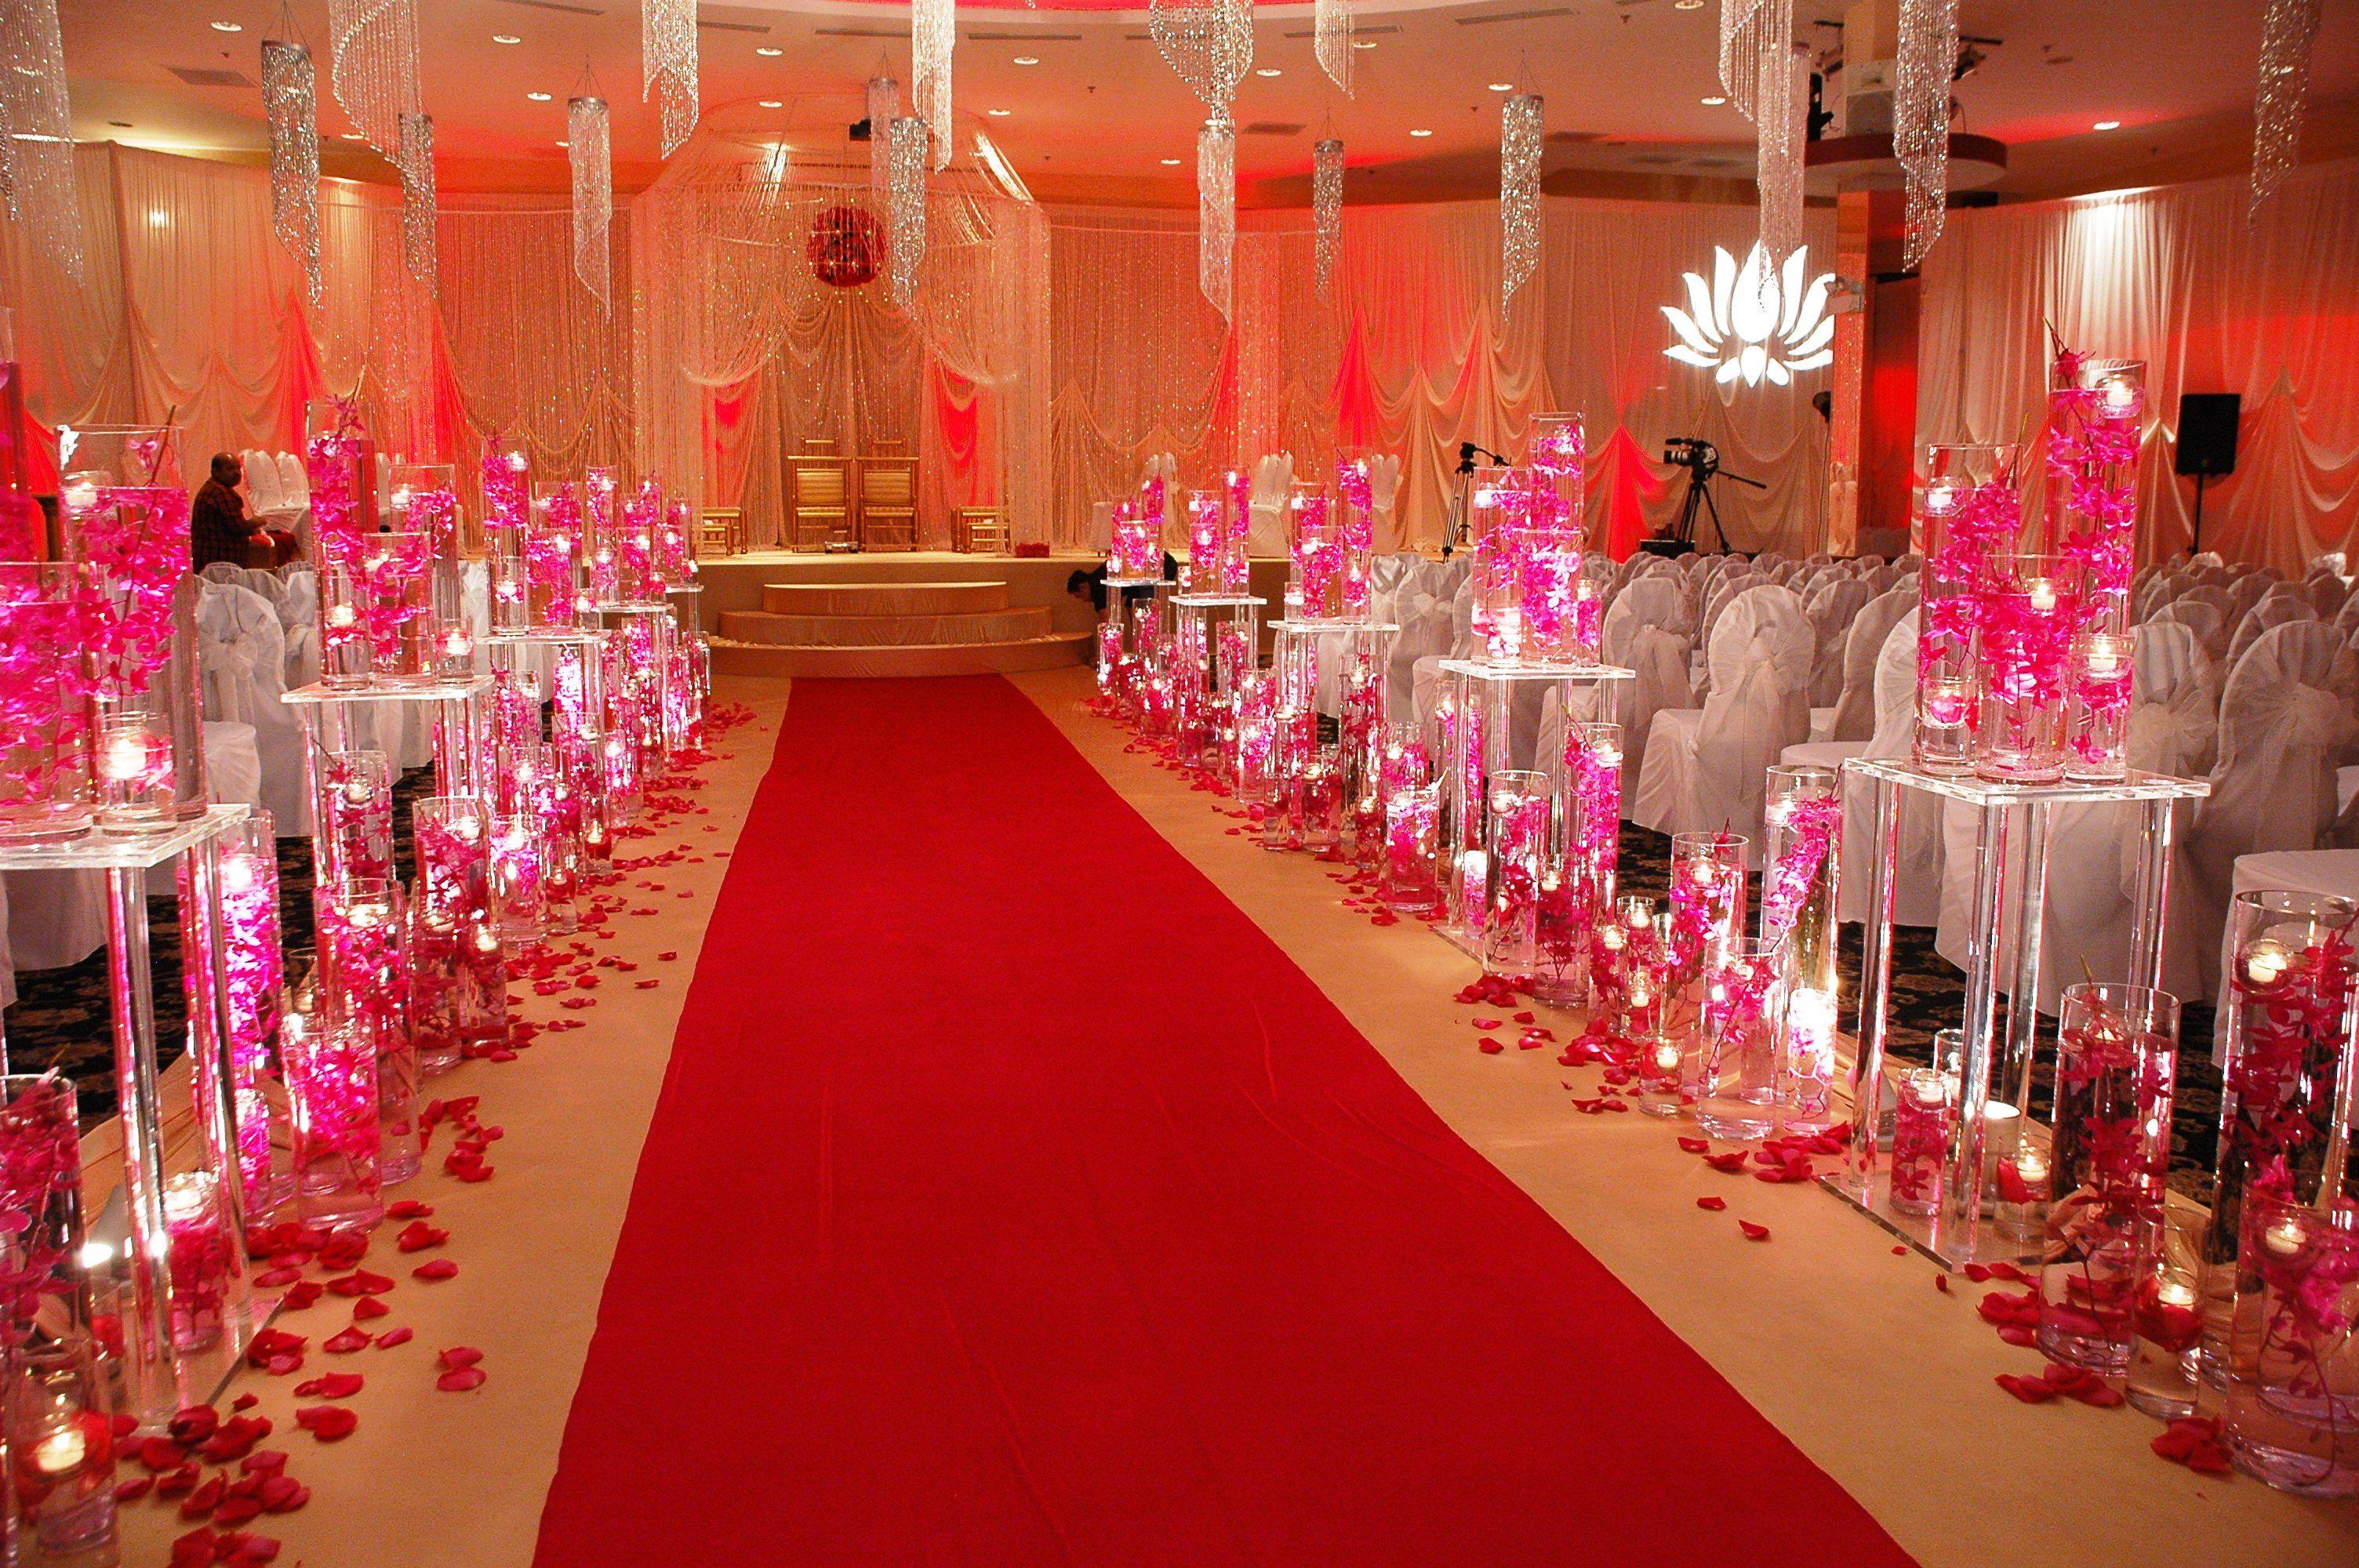 Candle Decorations For Wedding Ceremony Images Wedding Related Post For  Candle Decorations For Wedding Ceremony Cenypradufo